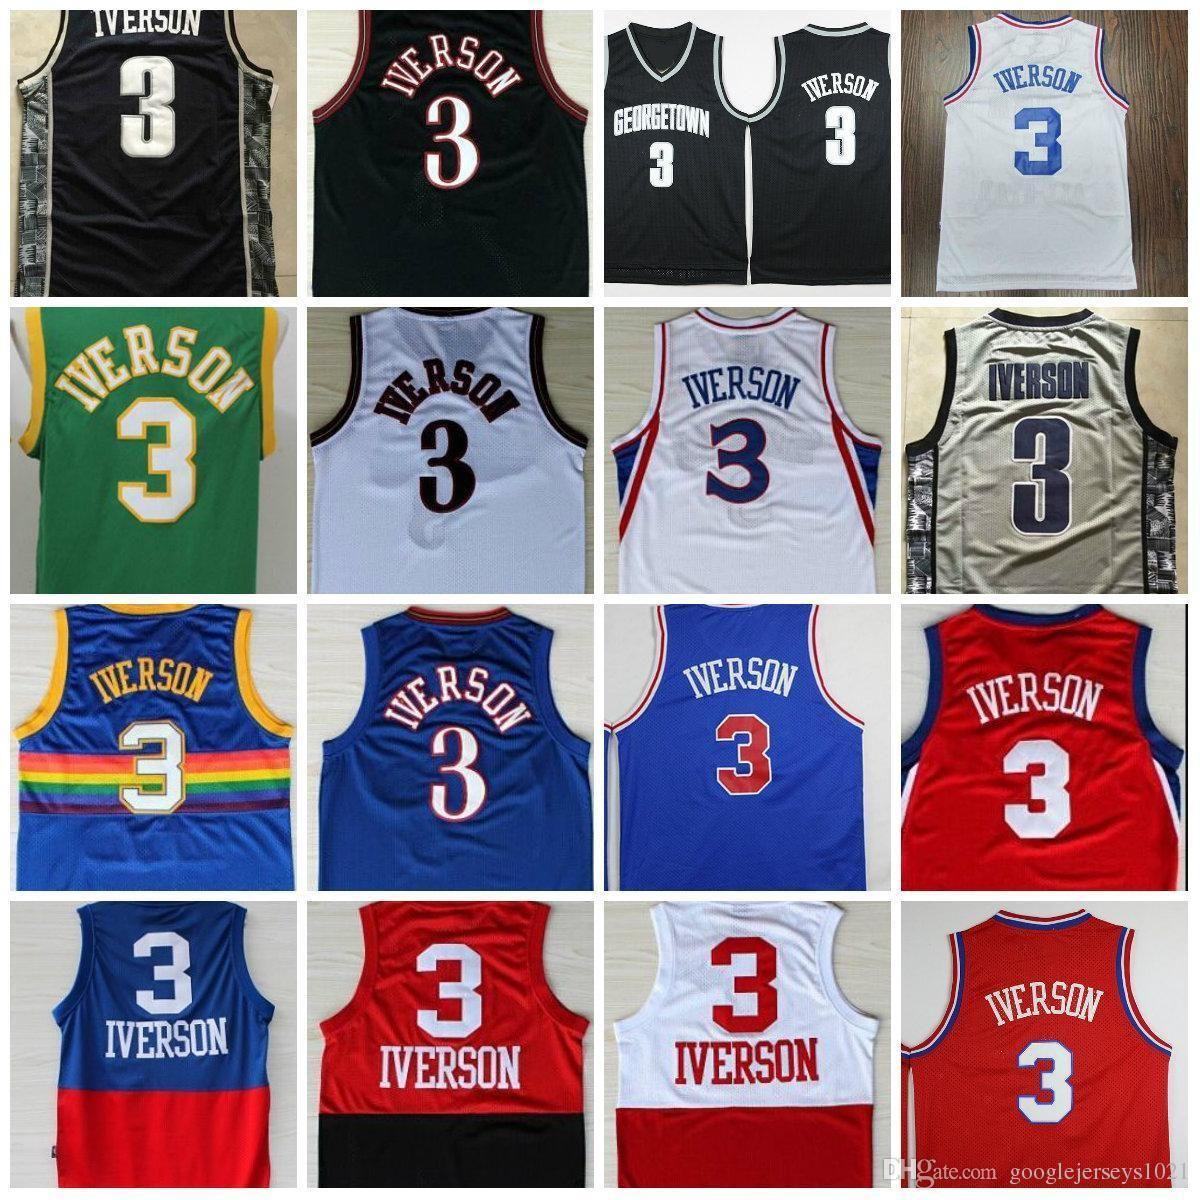 e69e7bf1f 2019 College NCAA Cheap Mens Allen Iverson Jerseys Georgetown Hoyas USA  Alll Star Black Blue White Rev 30 Classical Jerseys From Fanatical store